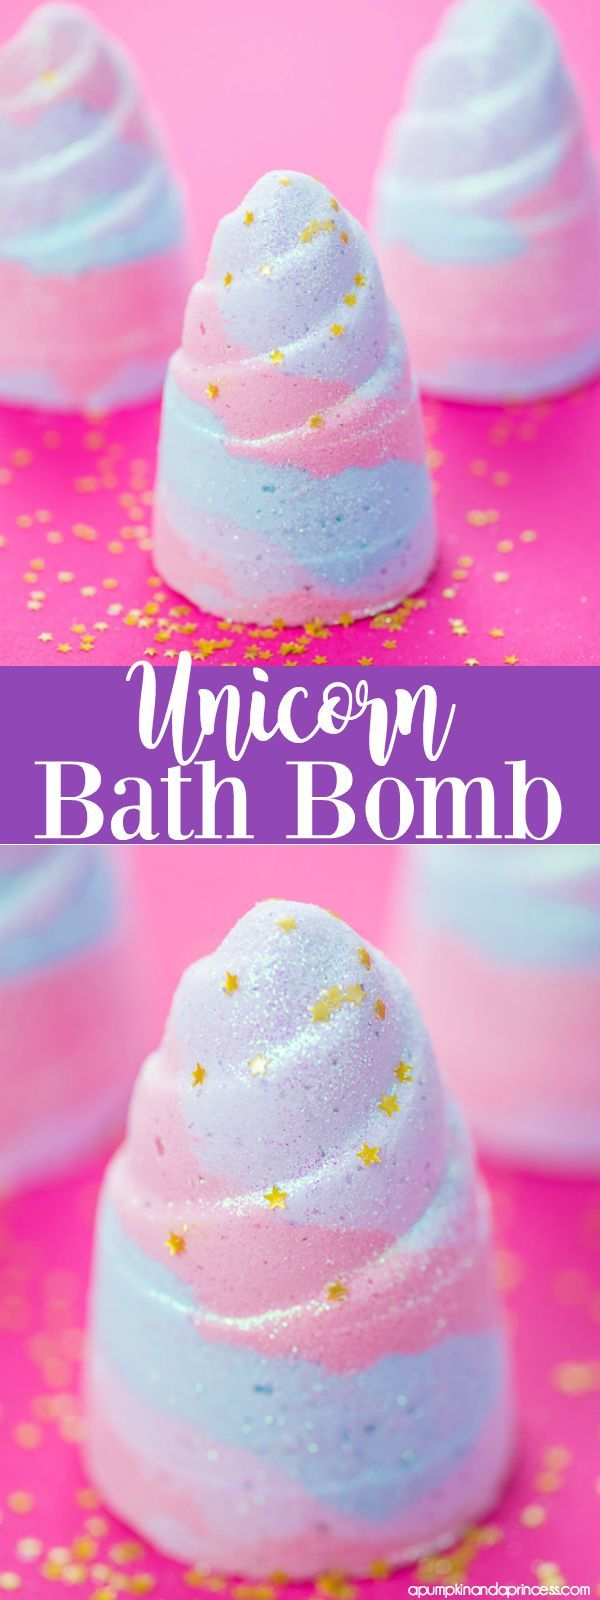 DIY Unicorn Bath Bomb - how to make a glitter unicorn horn bath bomb